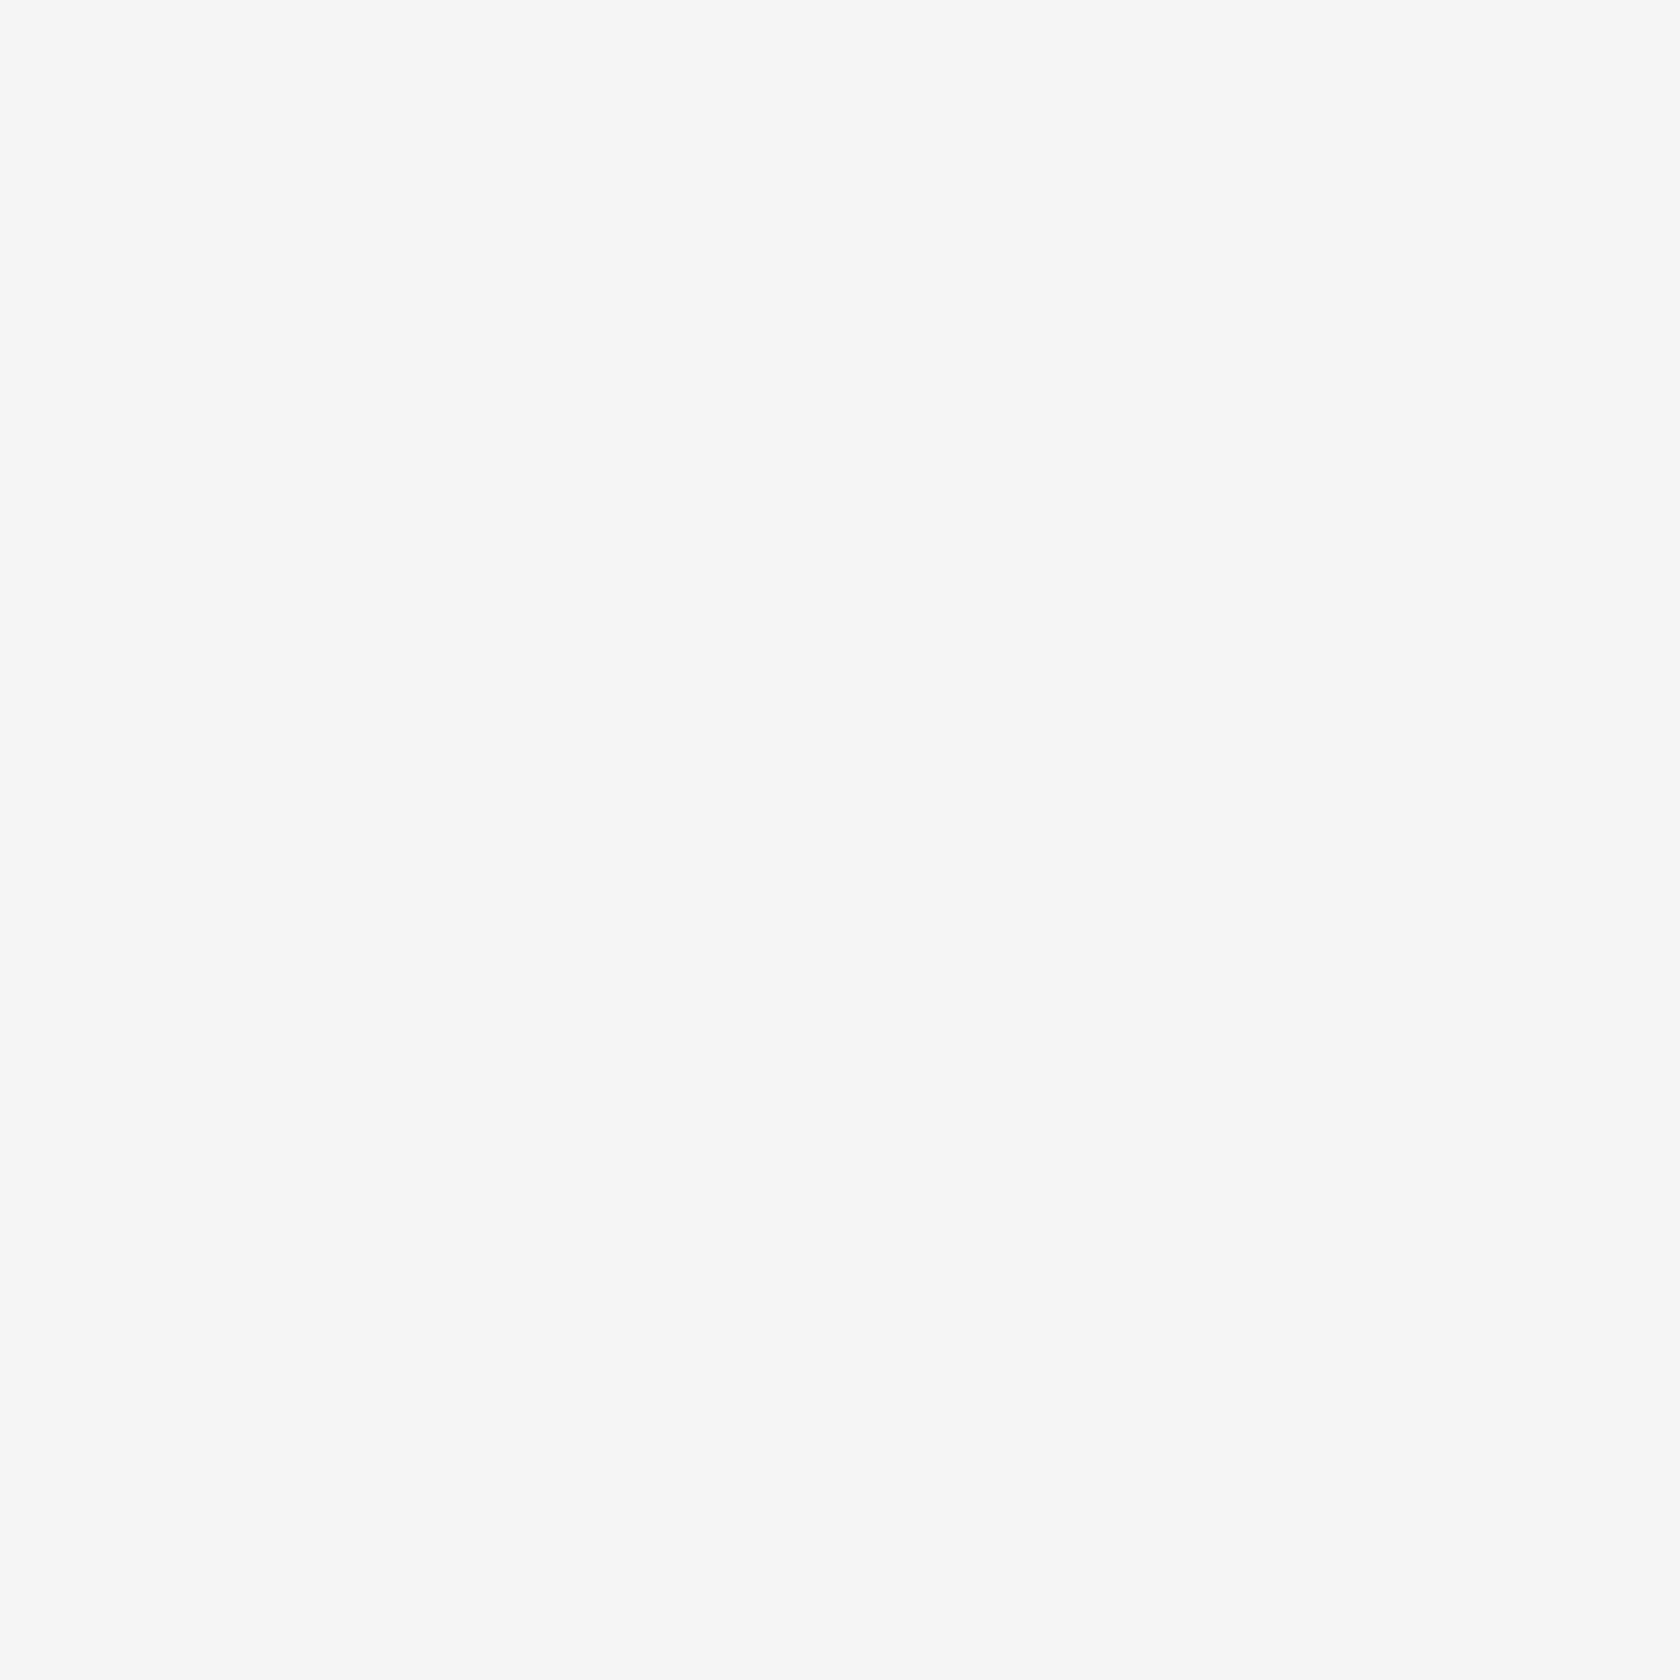 aa85245b6c35 Kelly bracelet, small model   Hermès